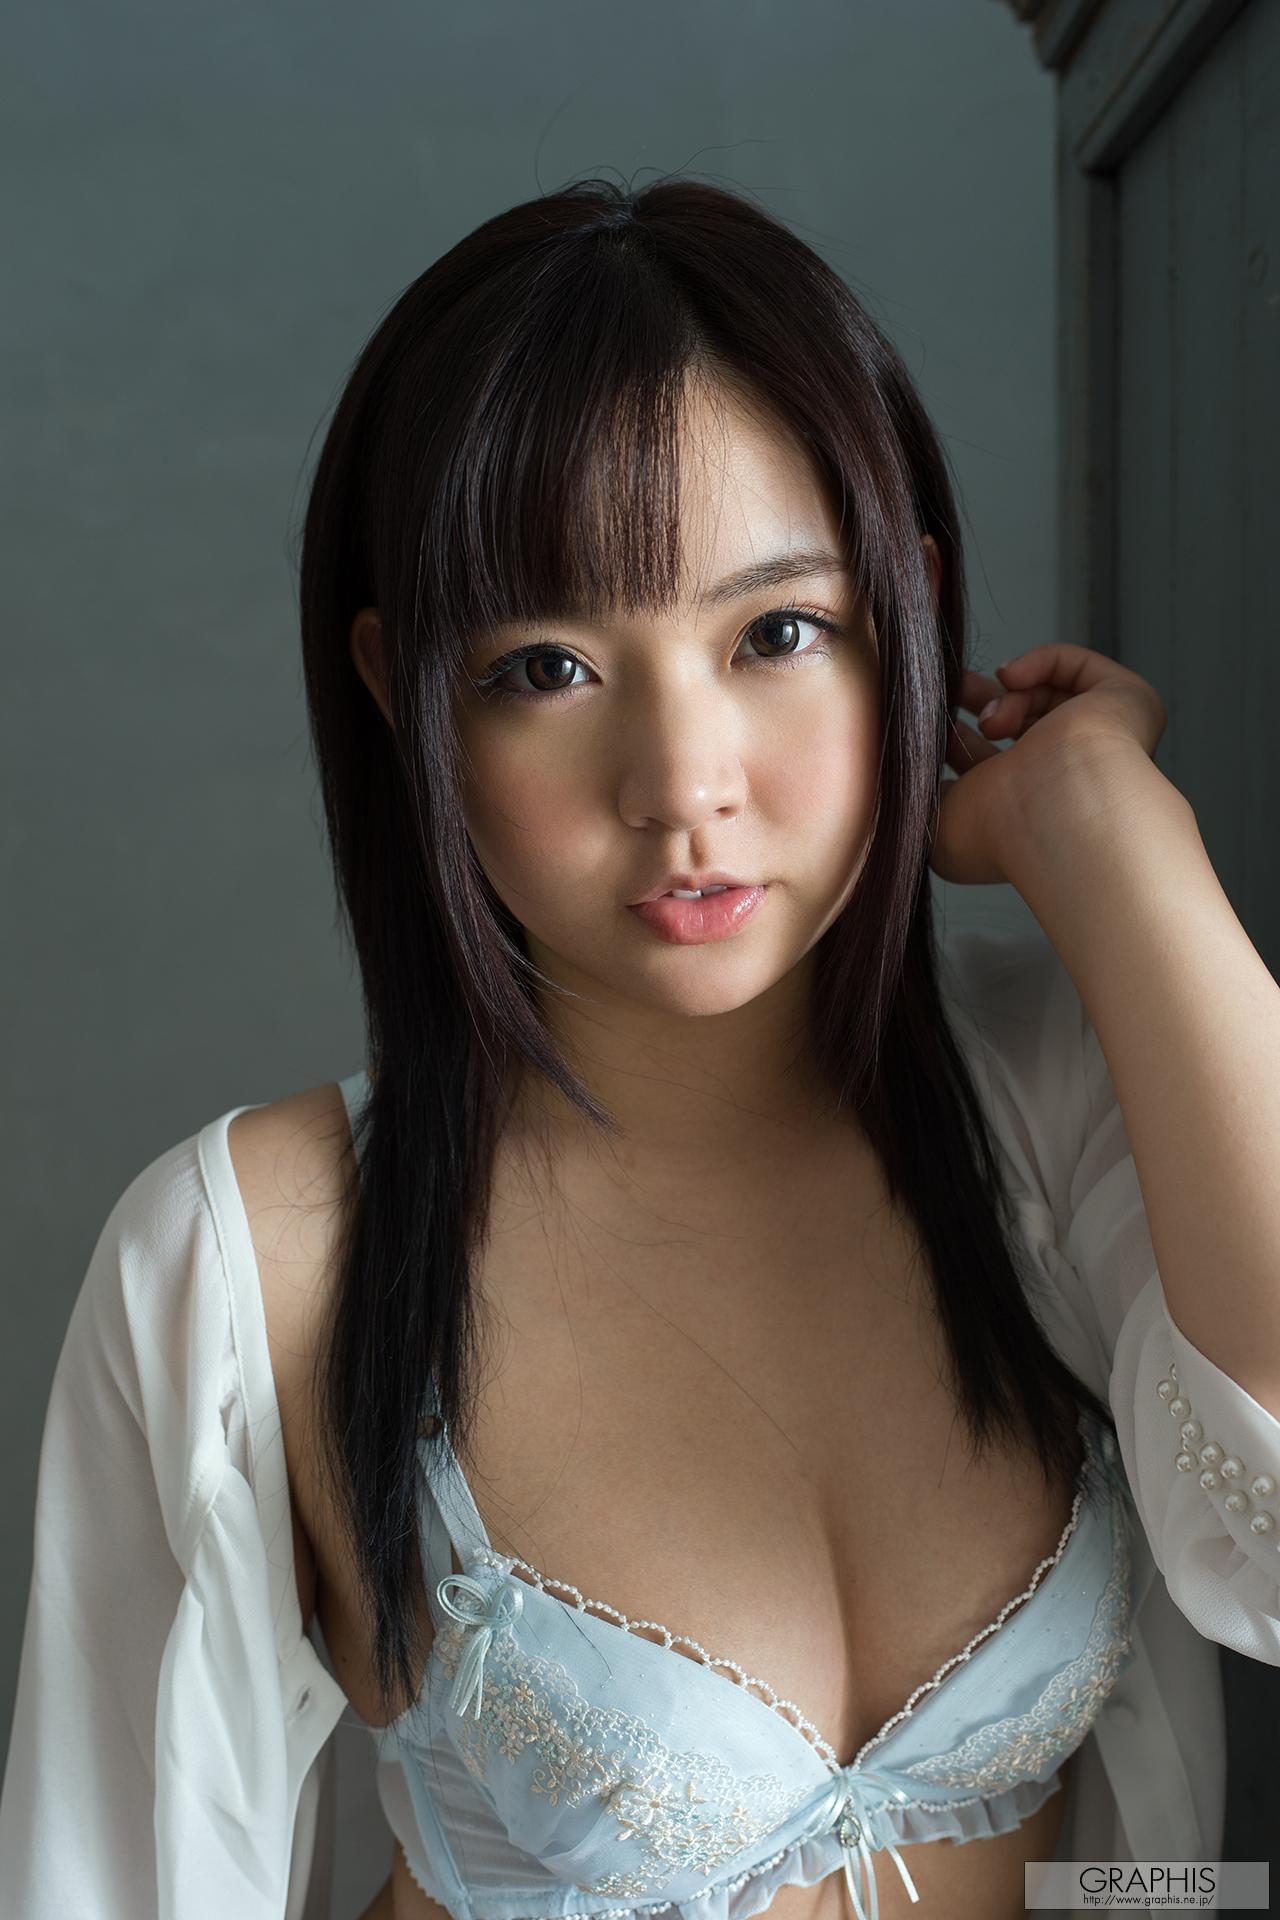 [YS Web] Vol.356 - Japanese Gravure Idol and Actress - Mai Nishida